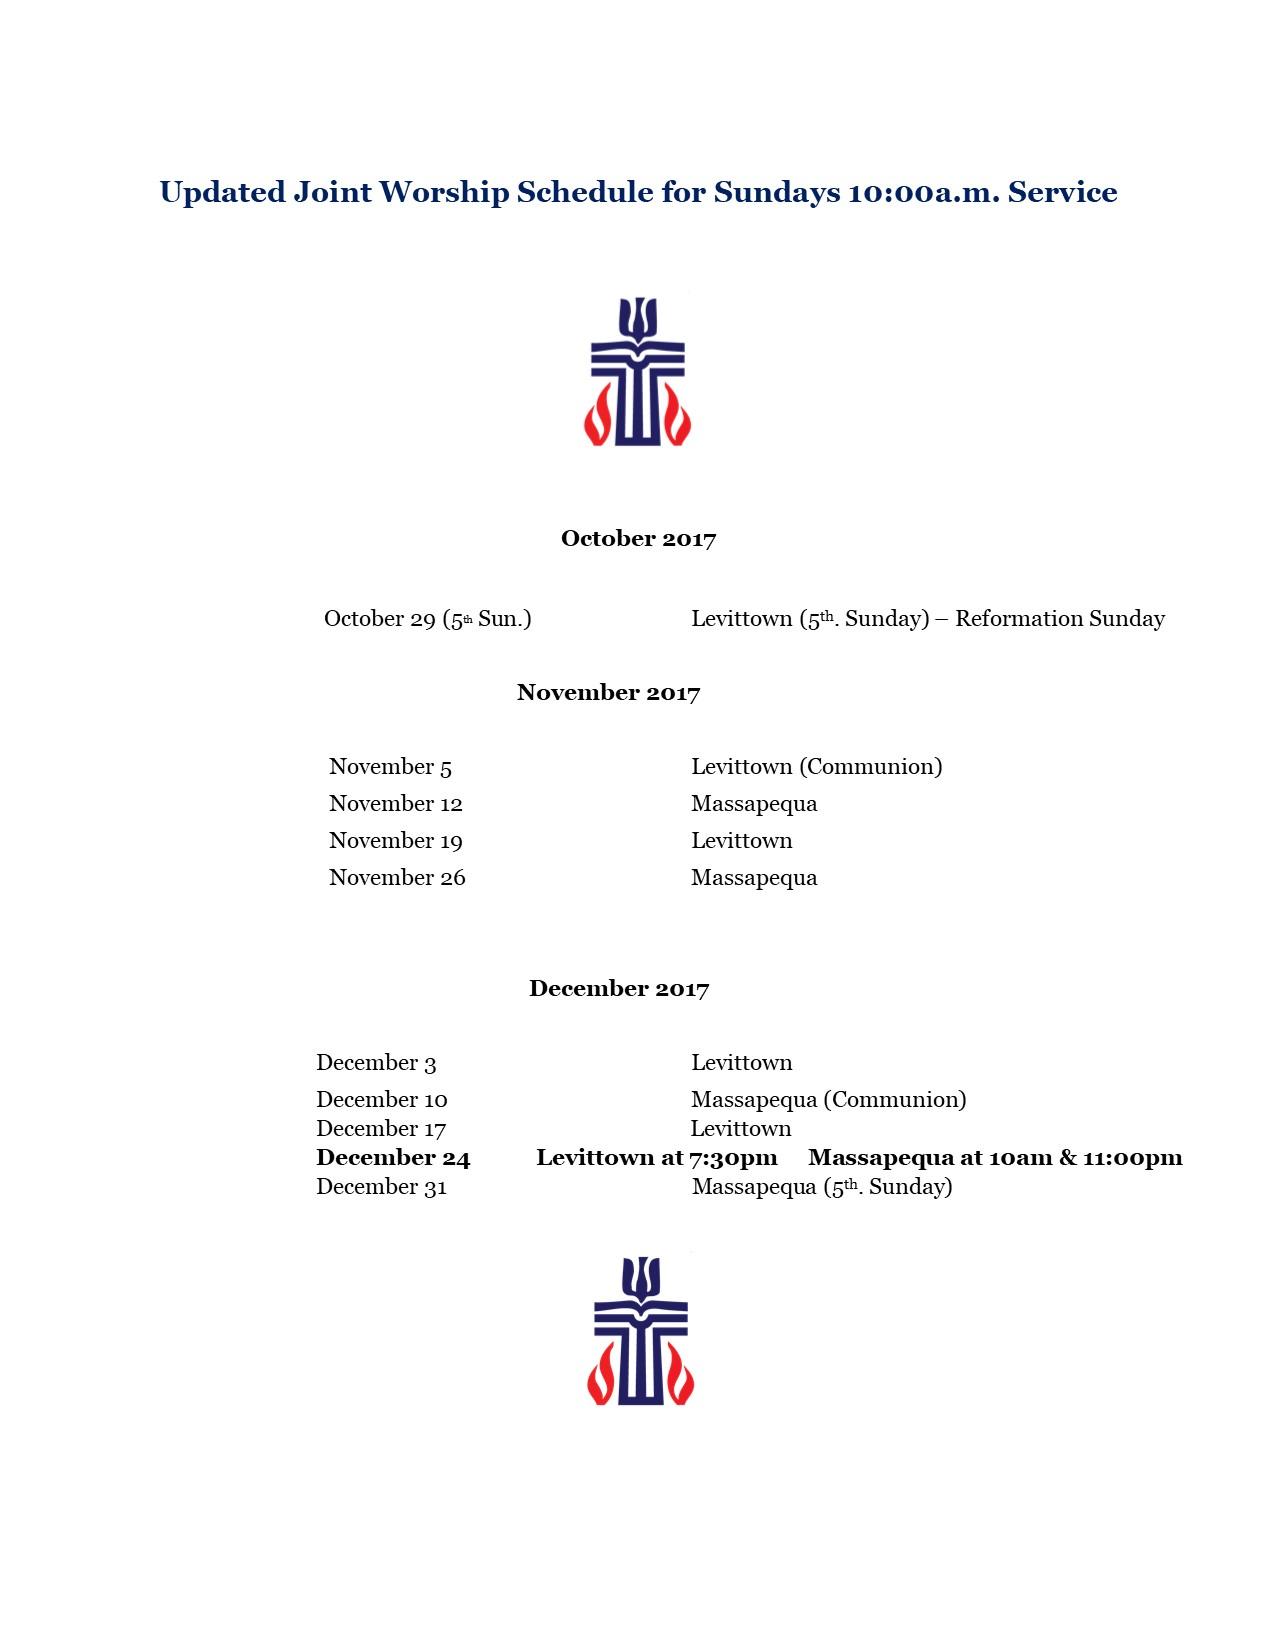 Worship Schedule for November - December 2017.pub